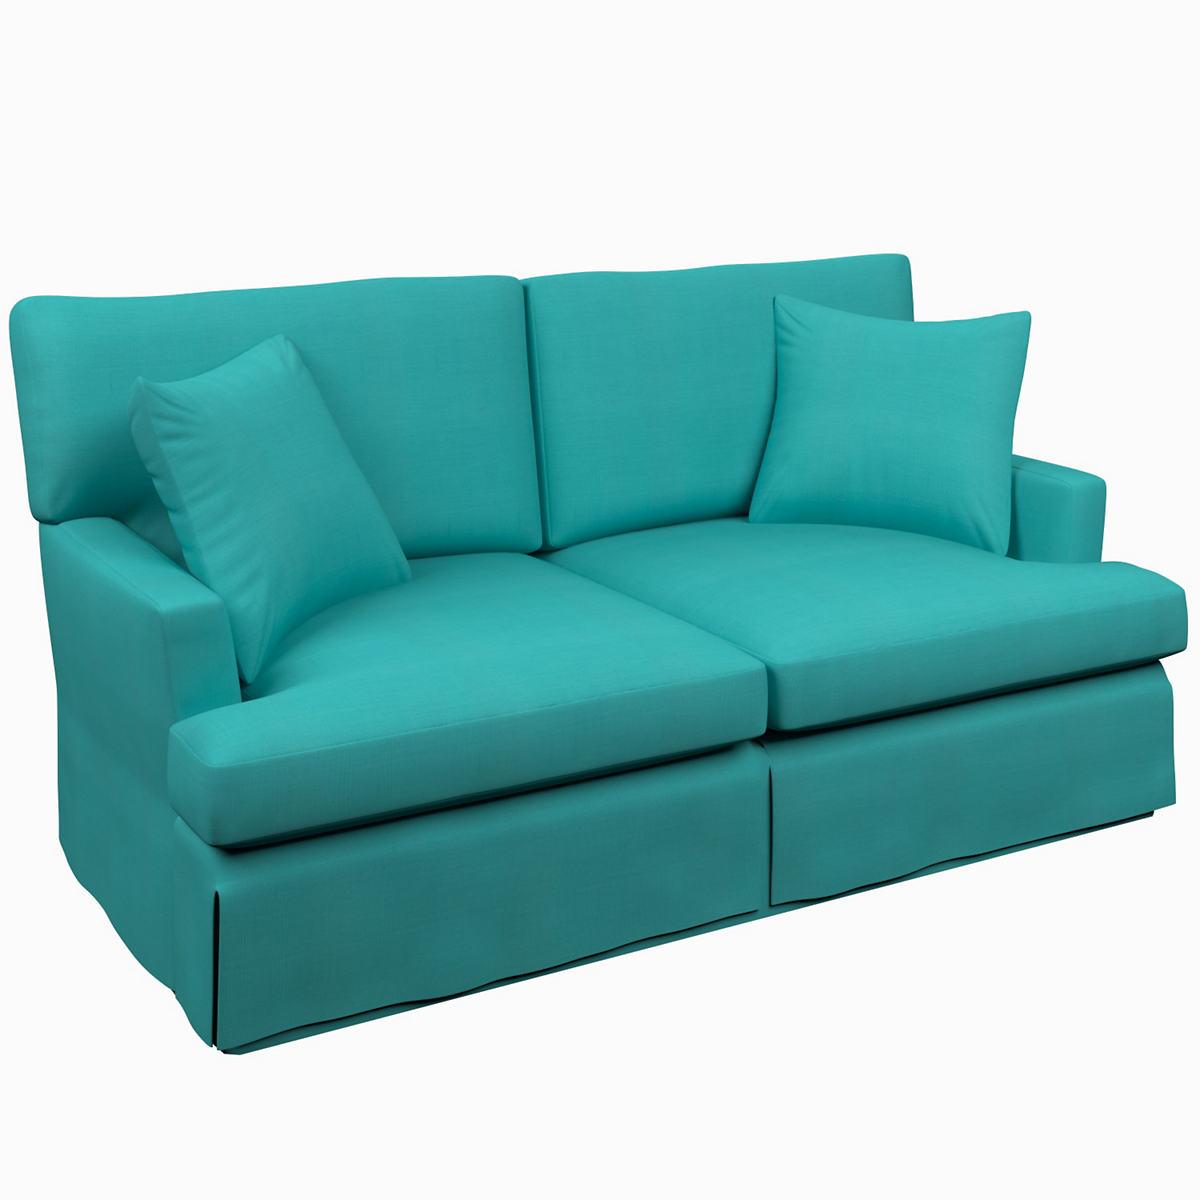 Estate Linen Turquoise Saybrook 2 Seater Slipcovered Sofa Furniture